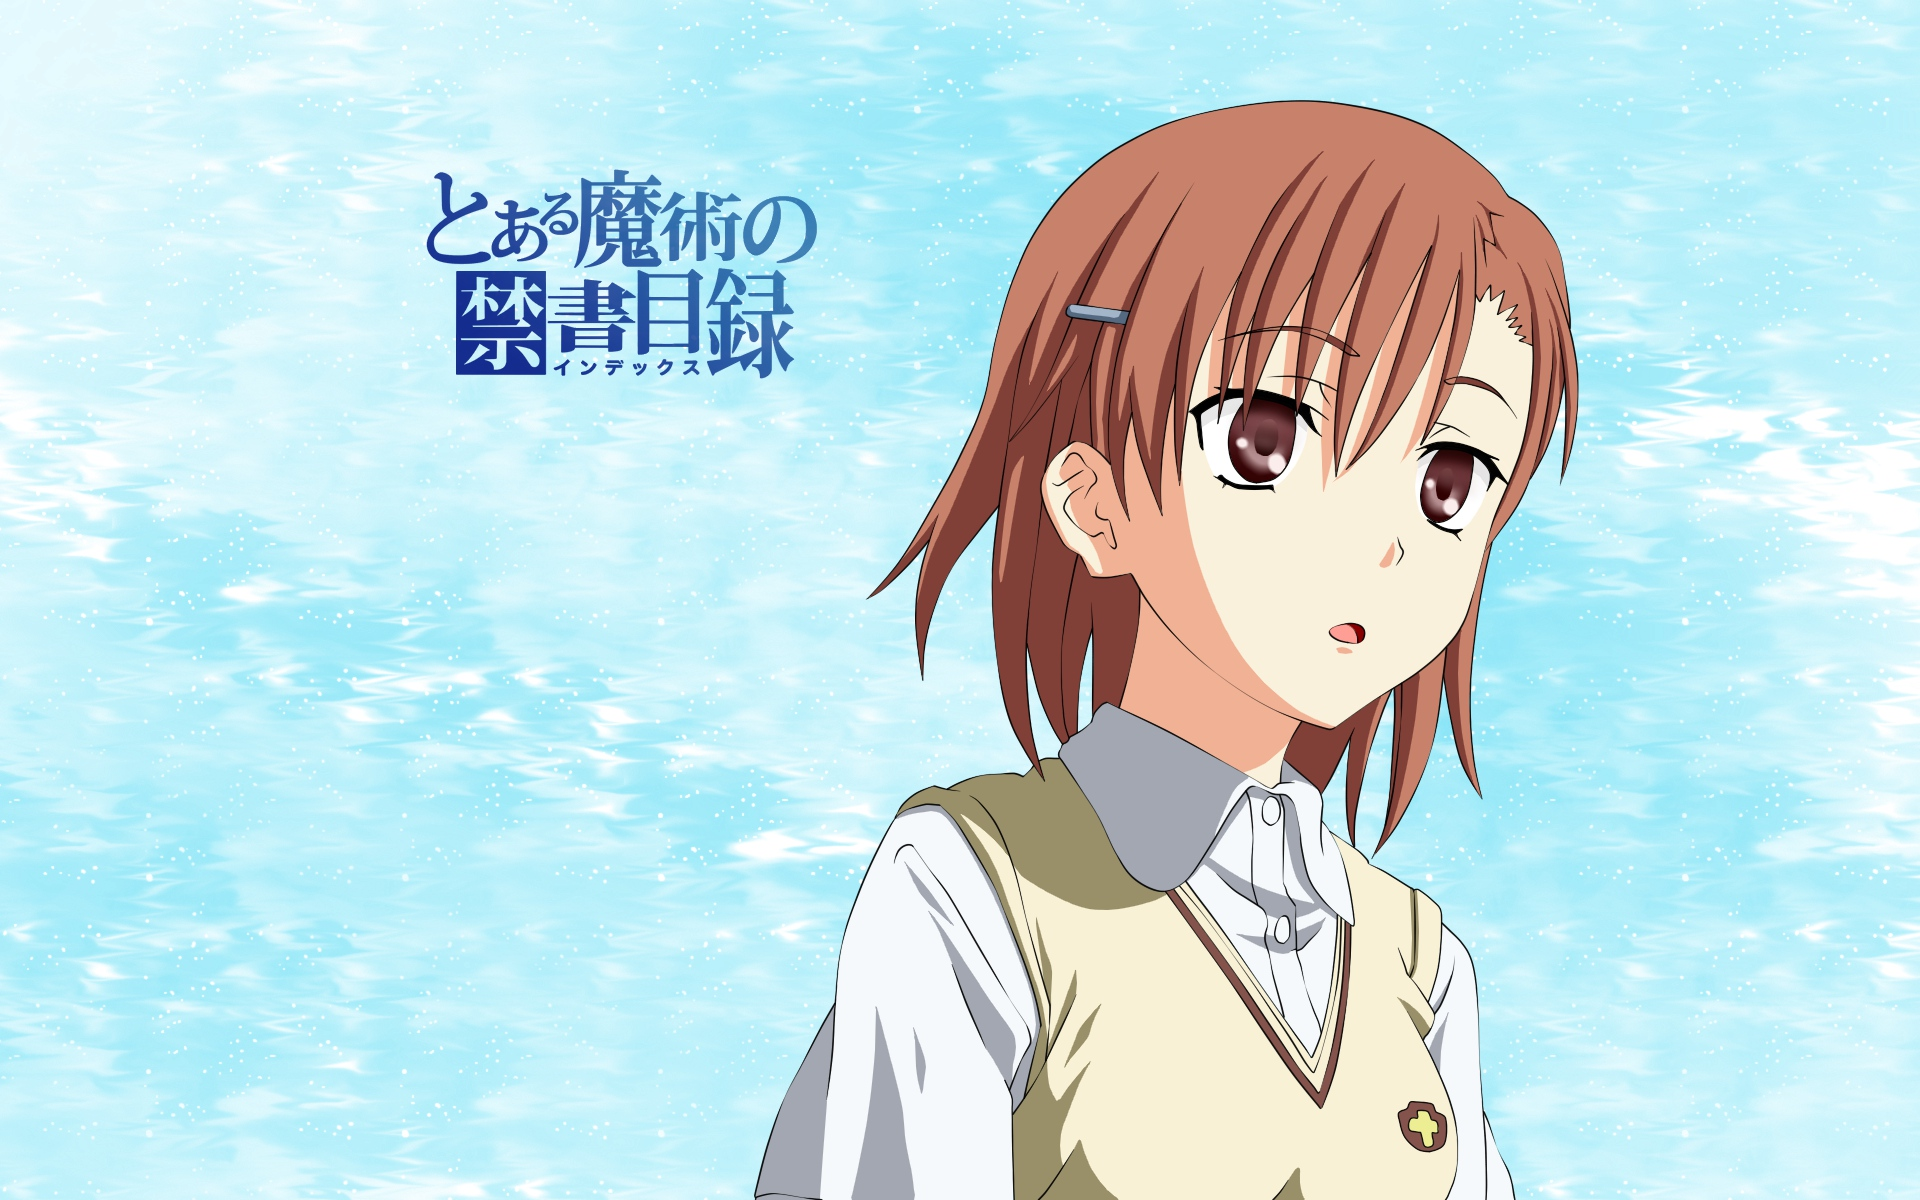 brown_eyes brown_hair misaka_mikoto school_uniform short_hair to_aru_majutsu_no_index vector water